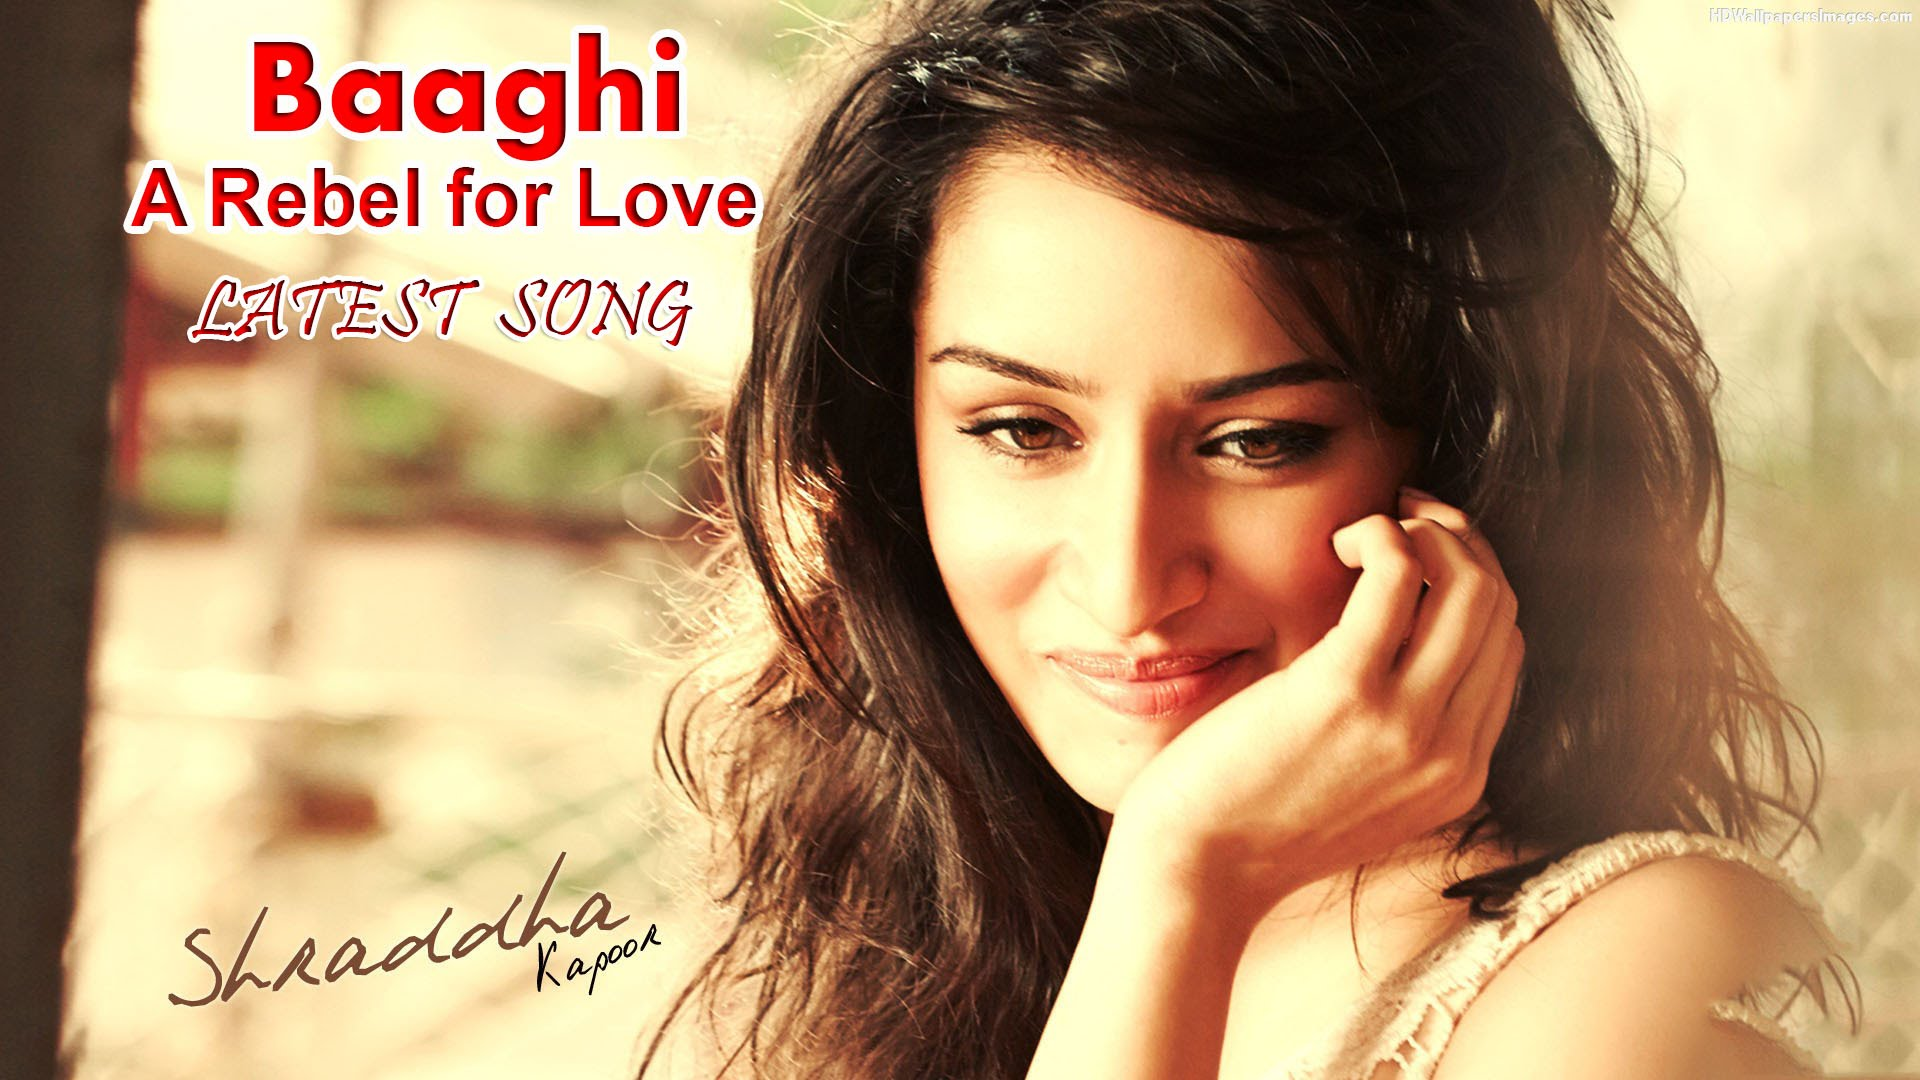 Baaghi movie heroine shraddha kapoor photos